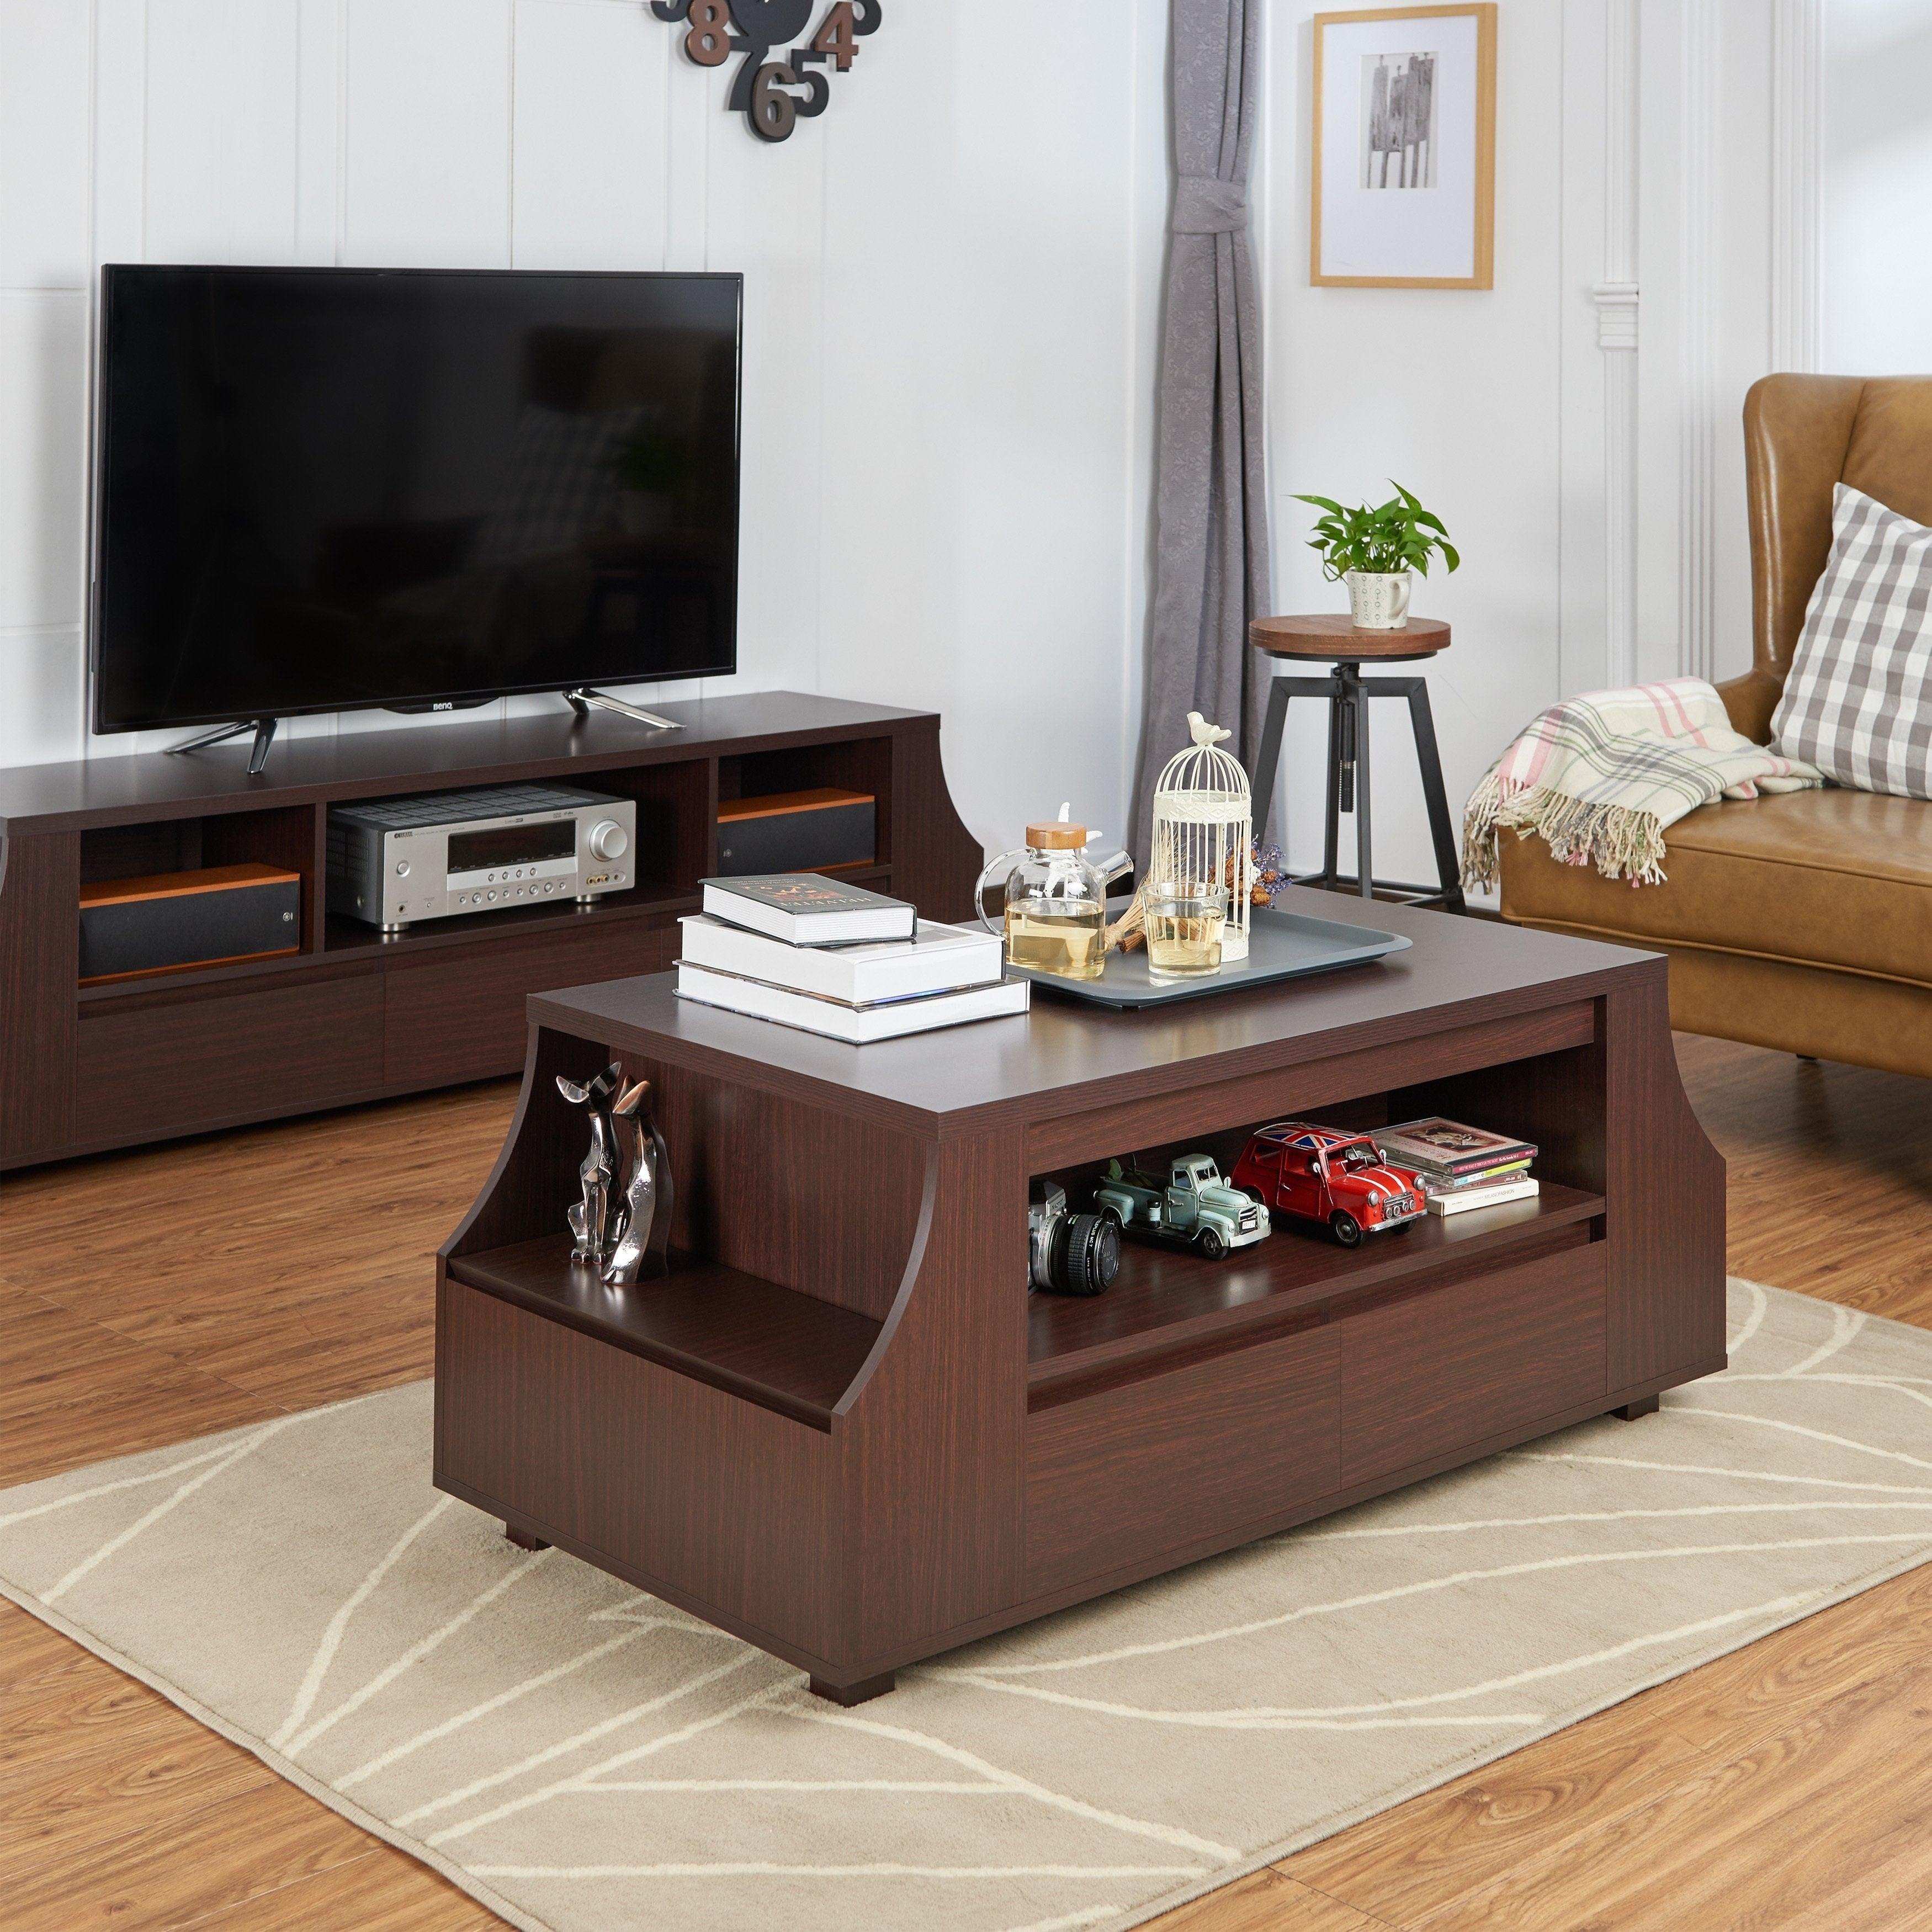 Shop Furniture Of America Basa Modern Walnut Wood Storage Coffee Table On Sale Overstock 11960831